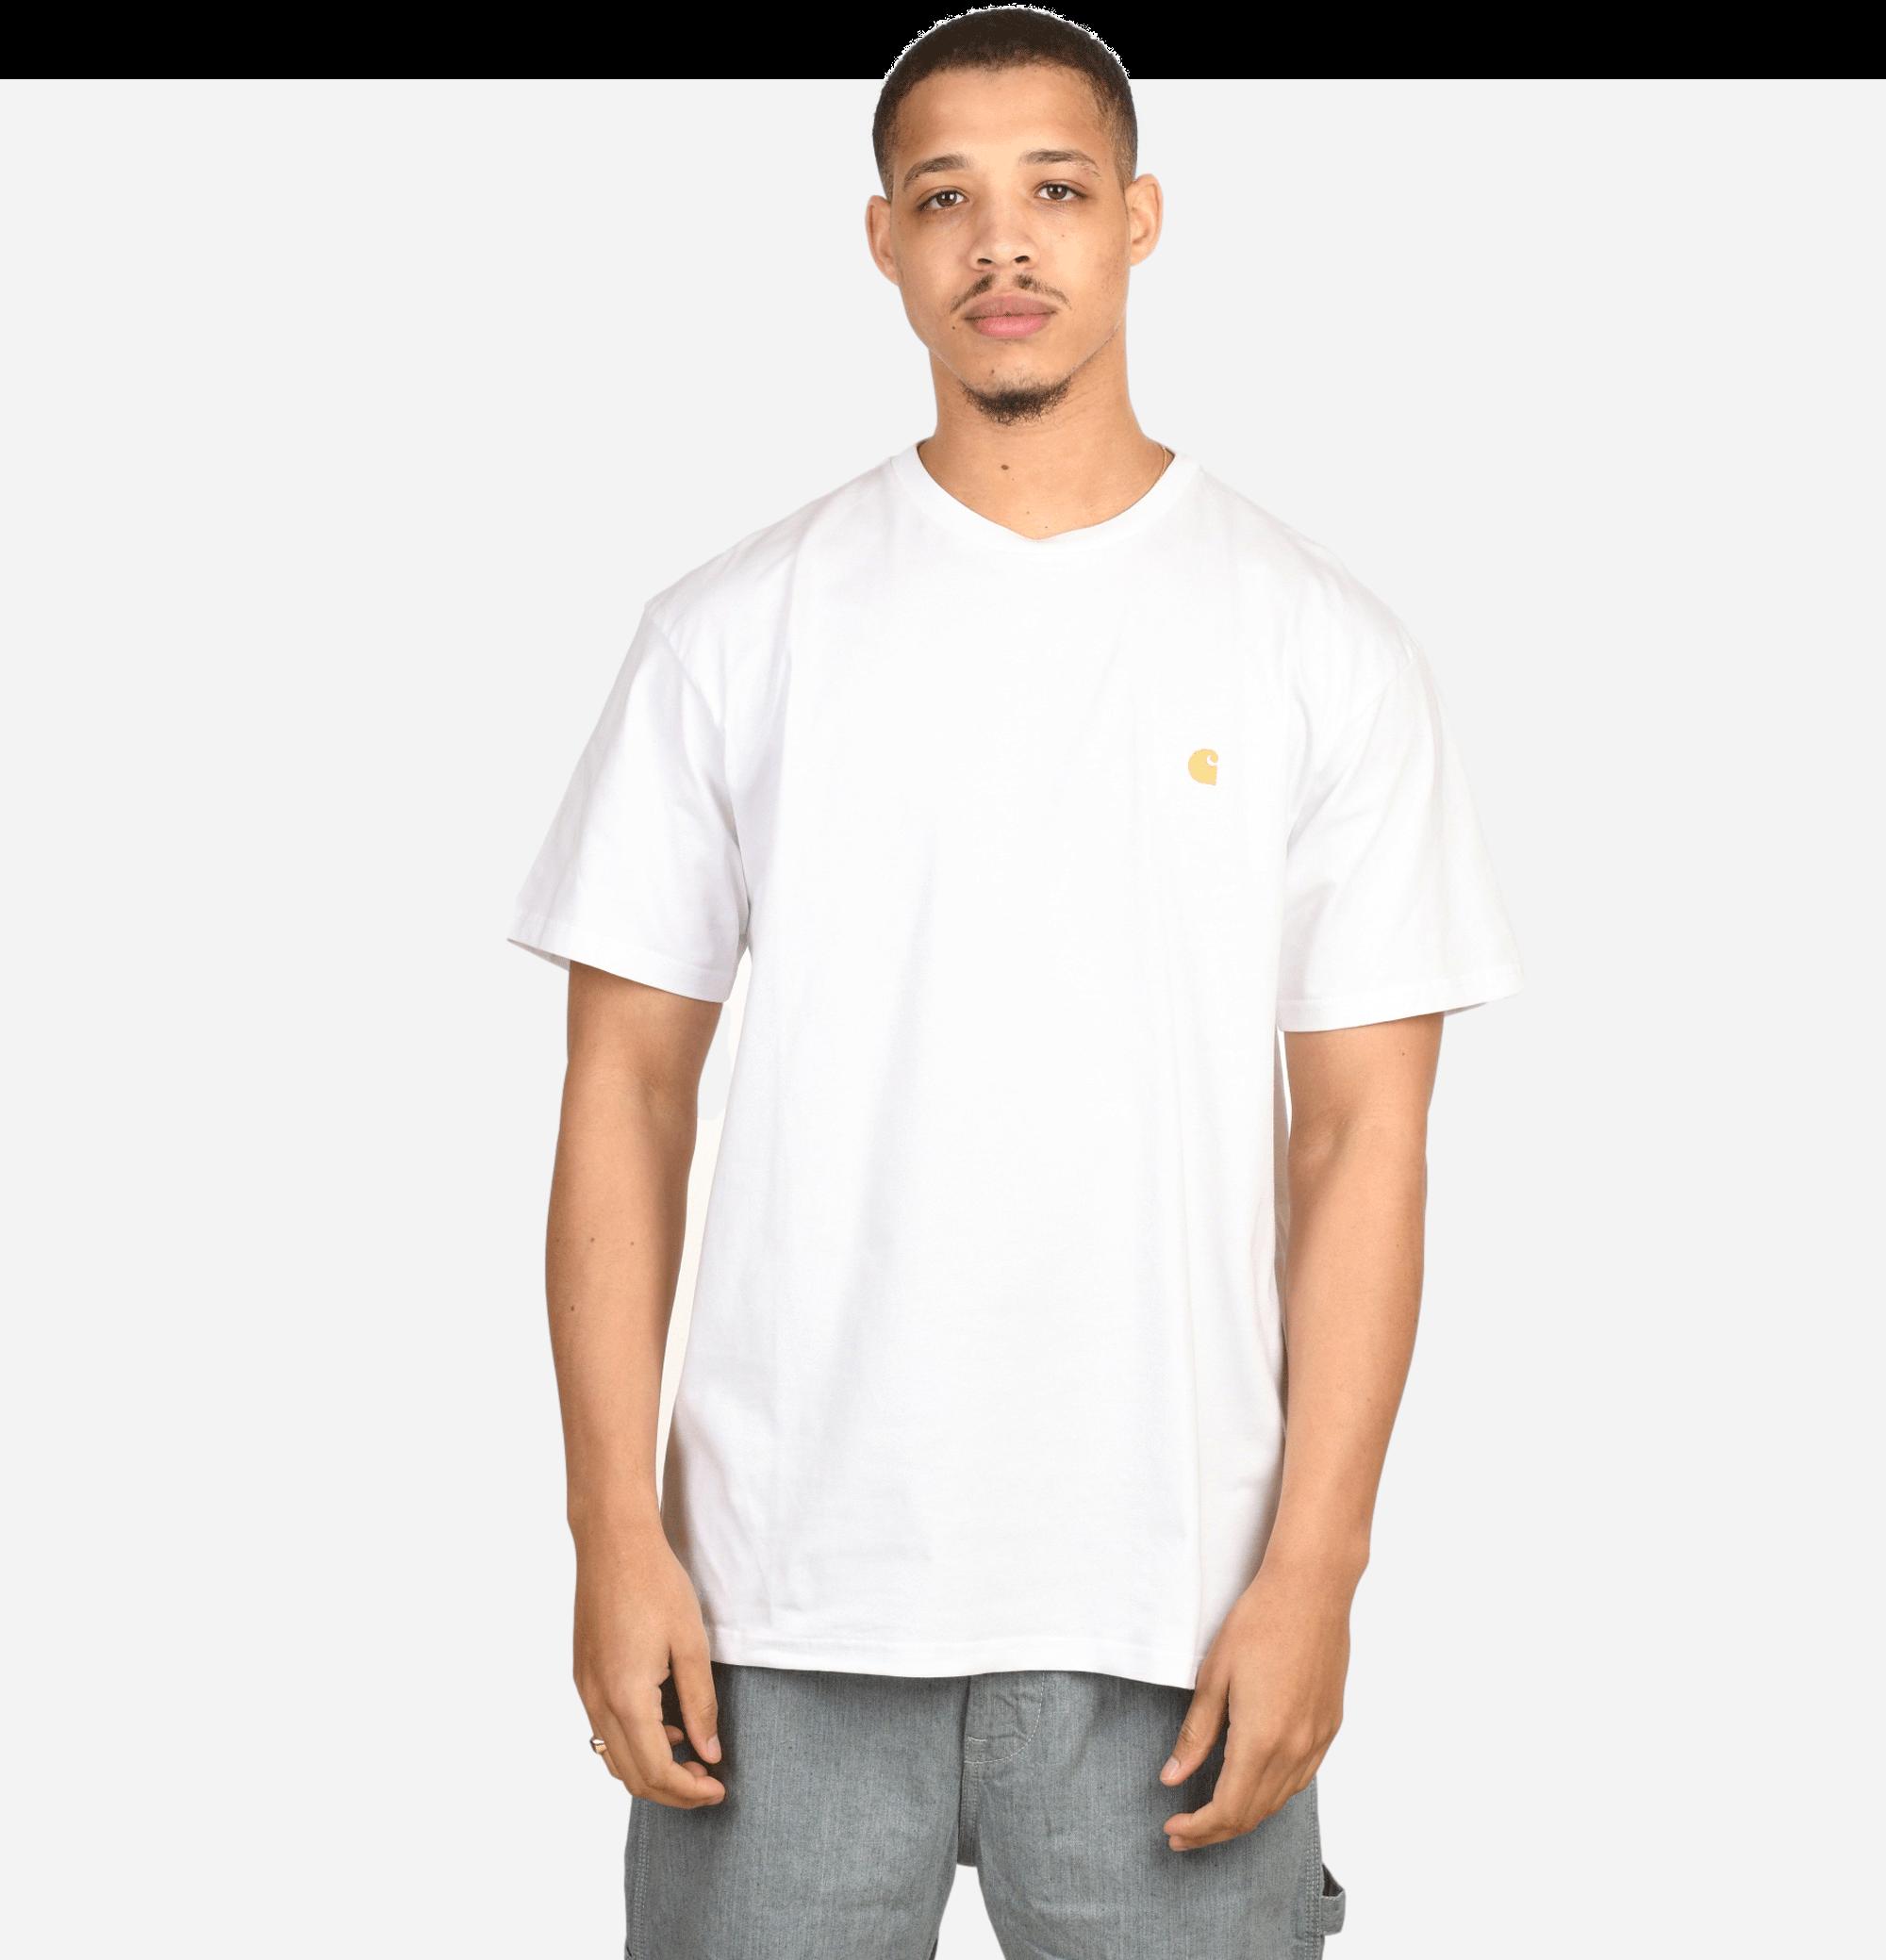 Chase T-shirt White